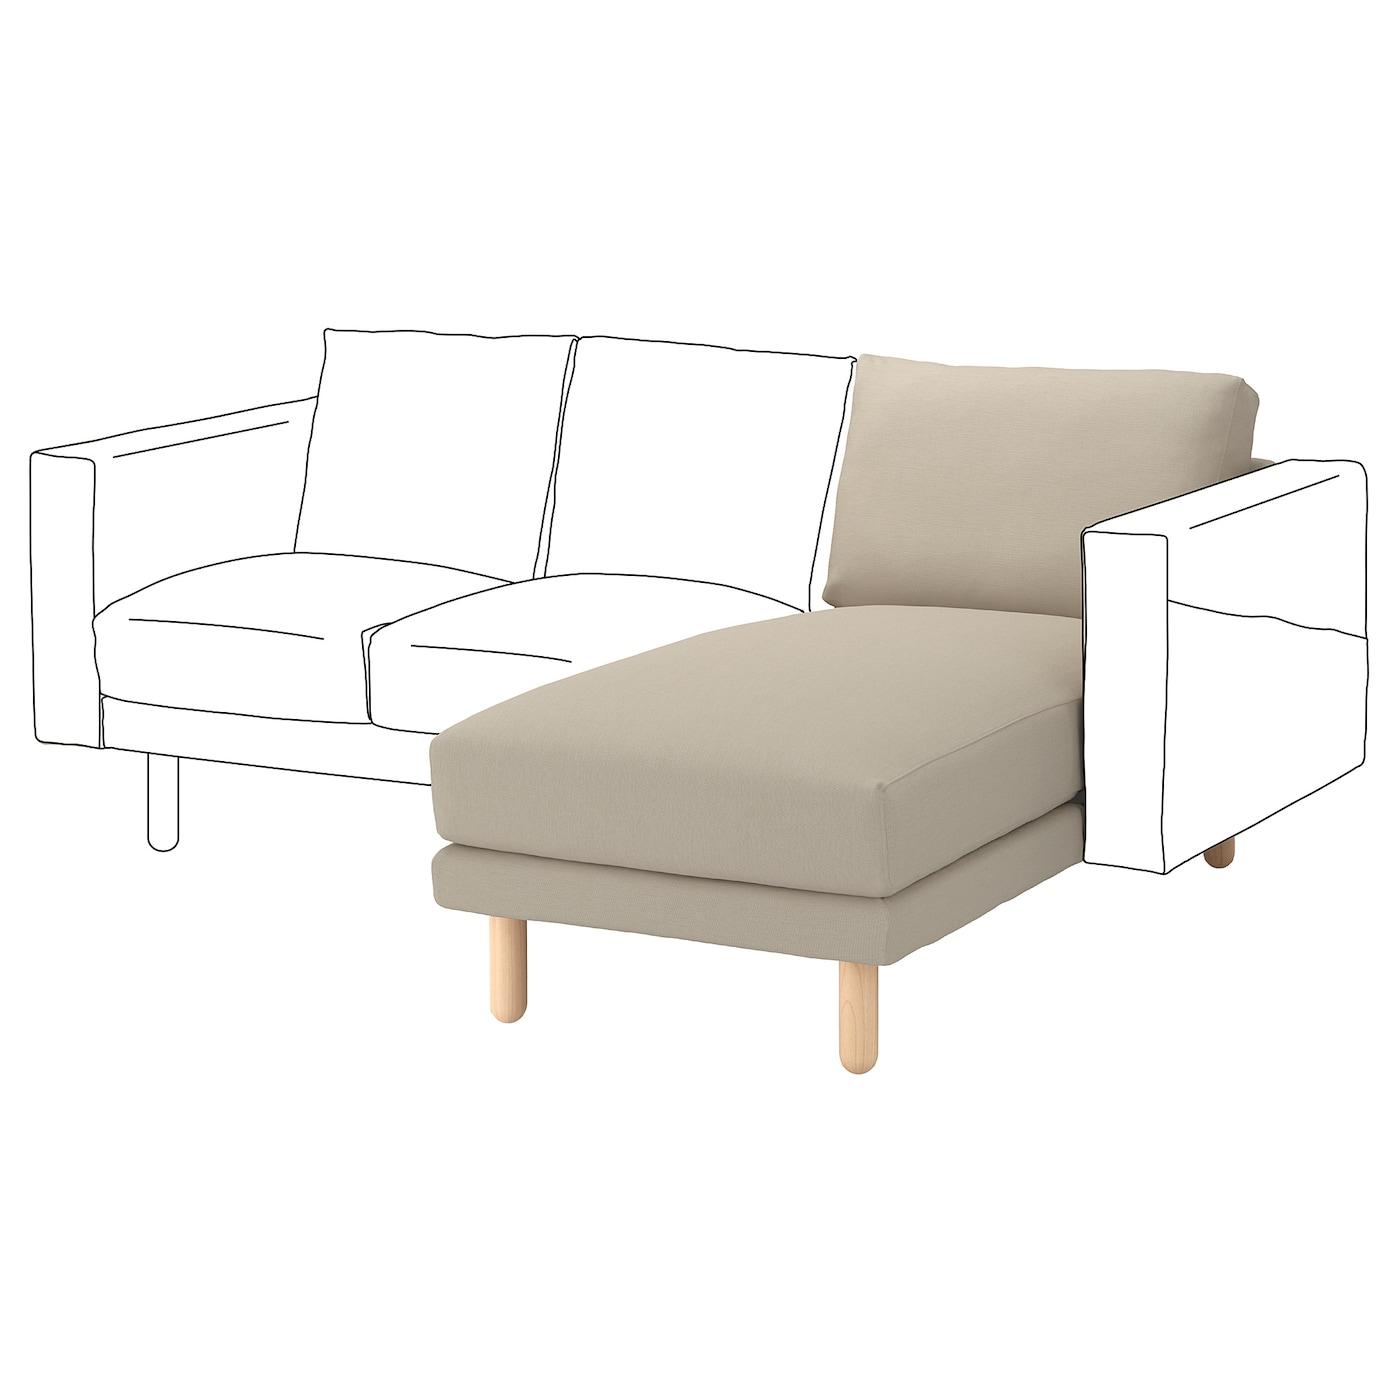 Norsborg chaise longue element edum beige berken ikea for Chaise longue nl